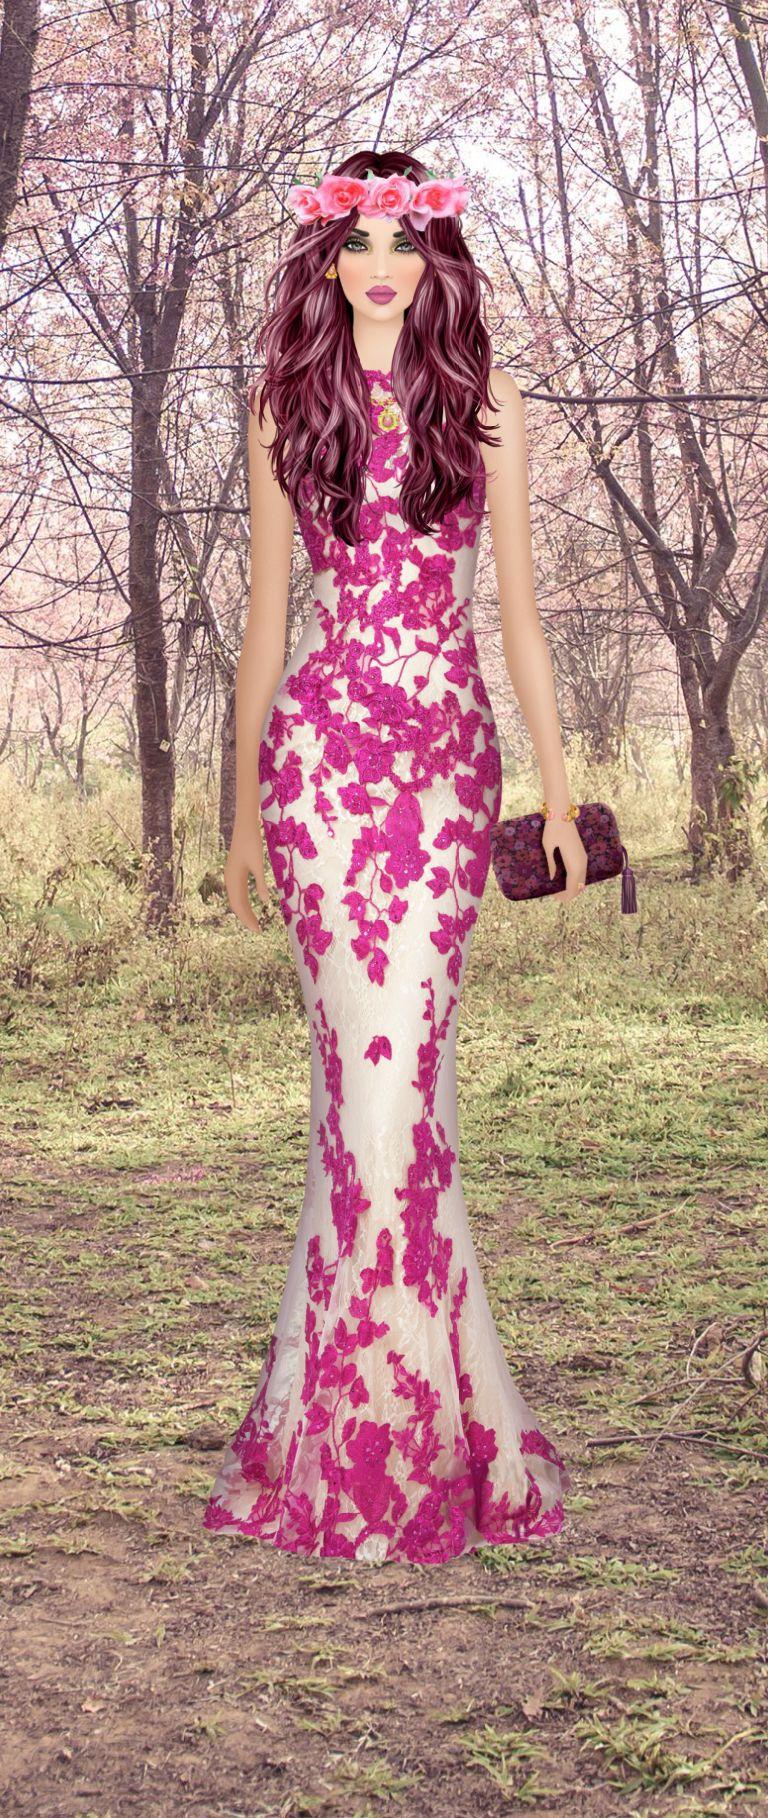 Pastel Princess - Winner 5+* | Darling Fashion Ideas from Covet ...